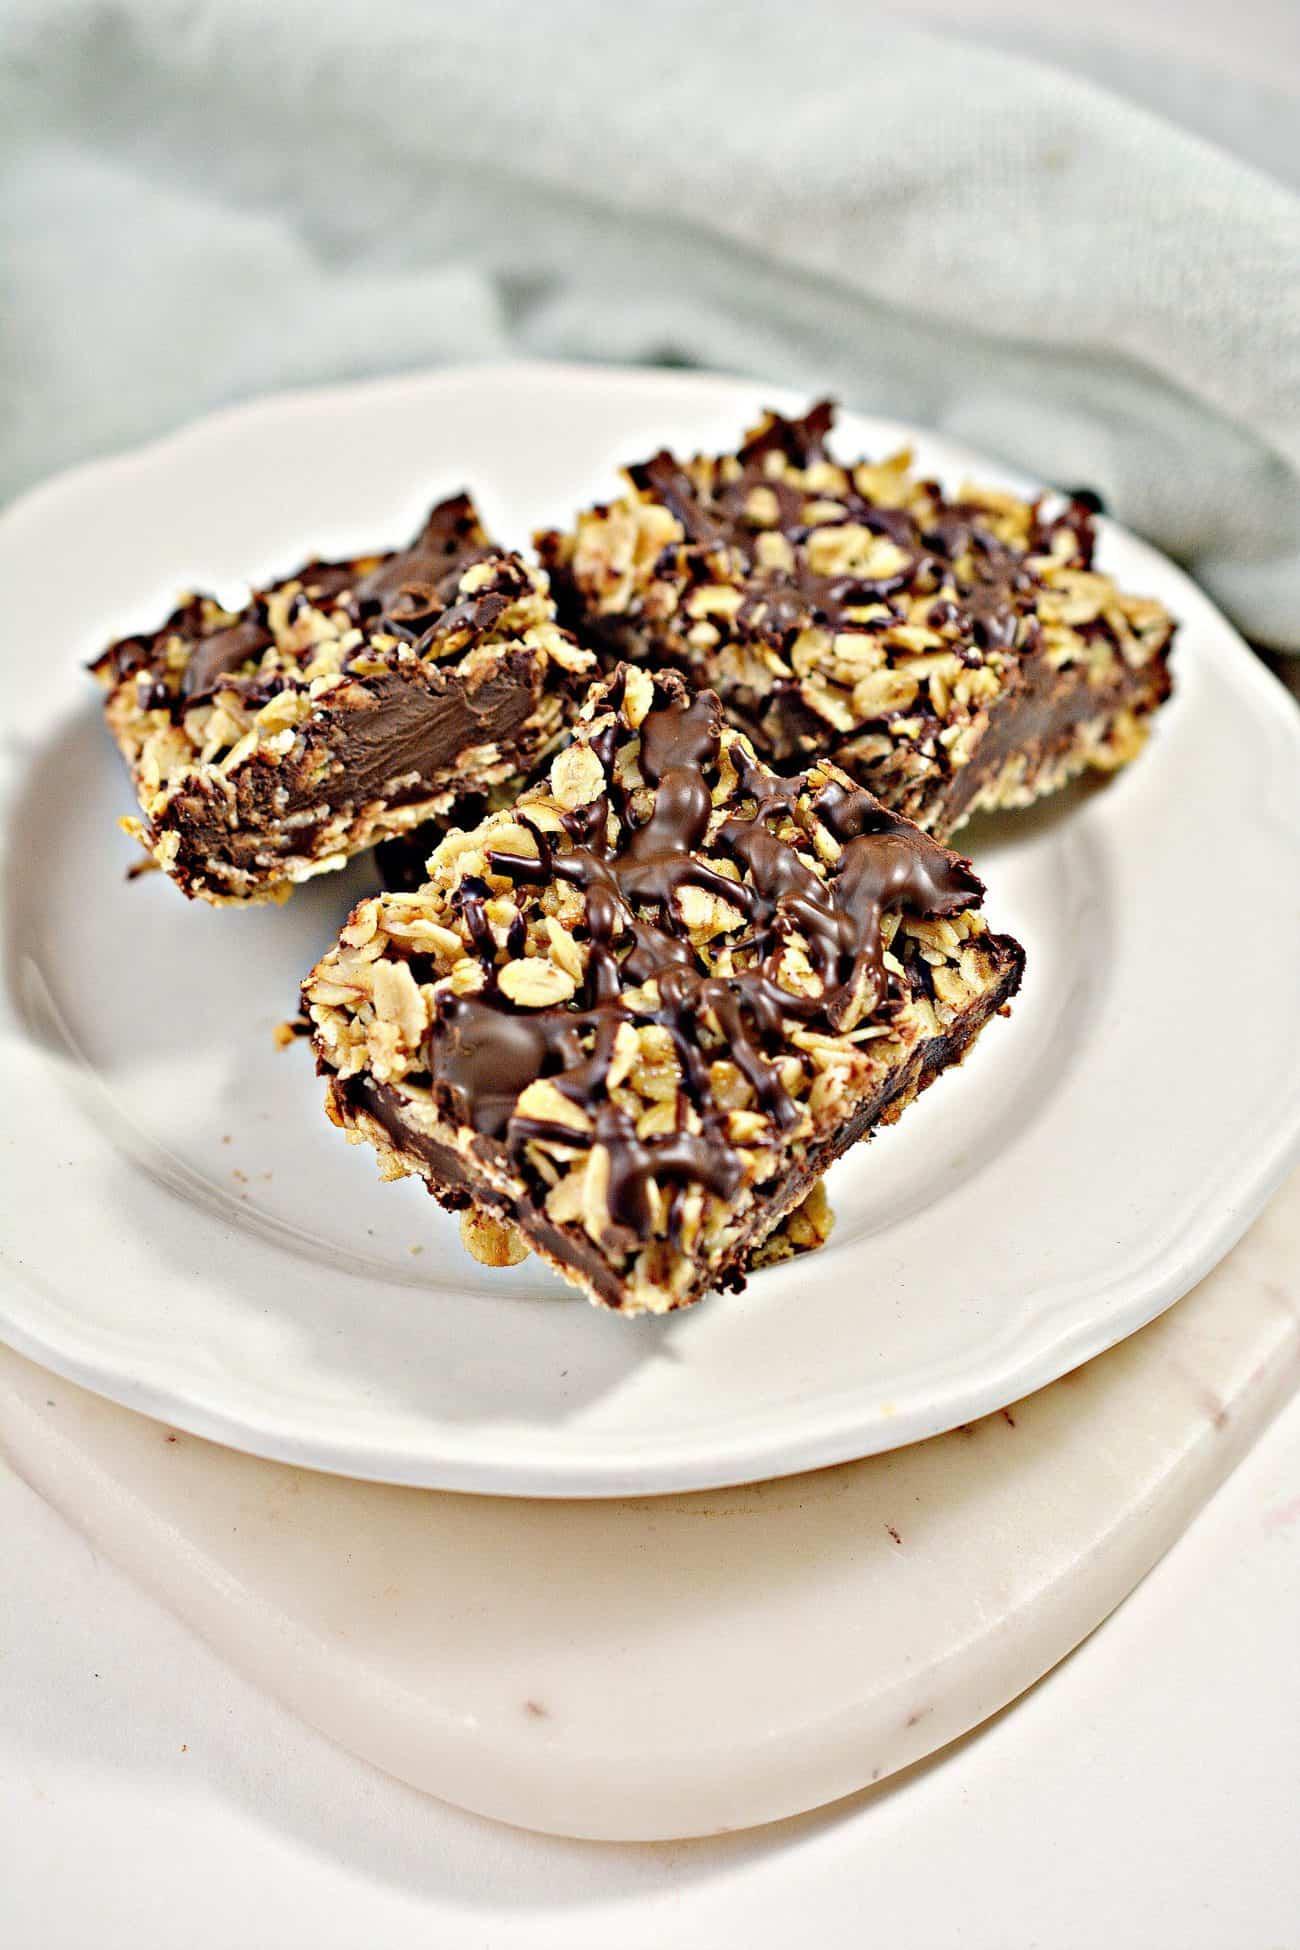 No-Bake Chocolate Oat Bars